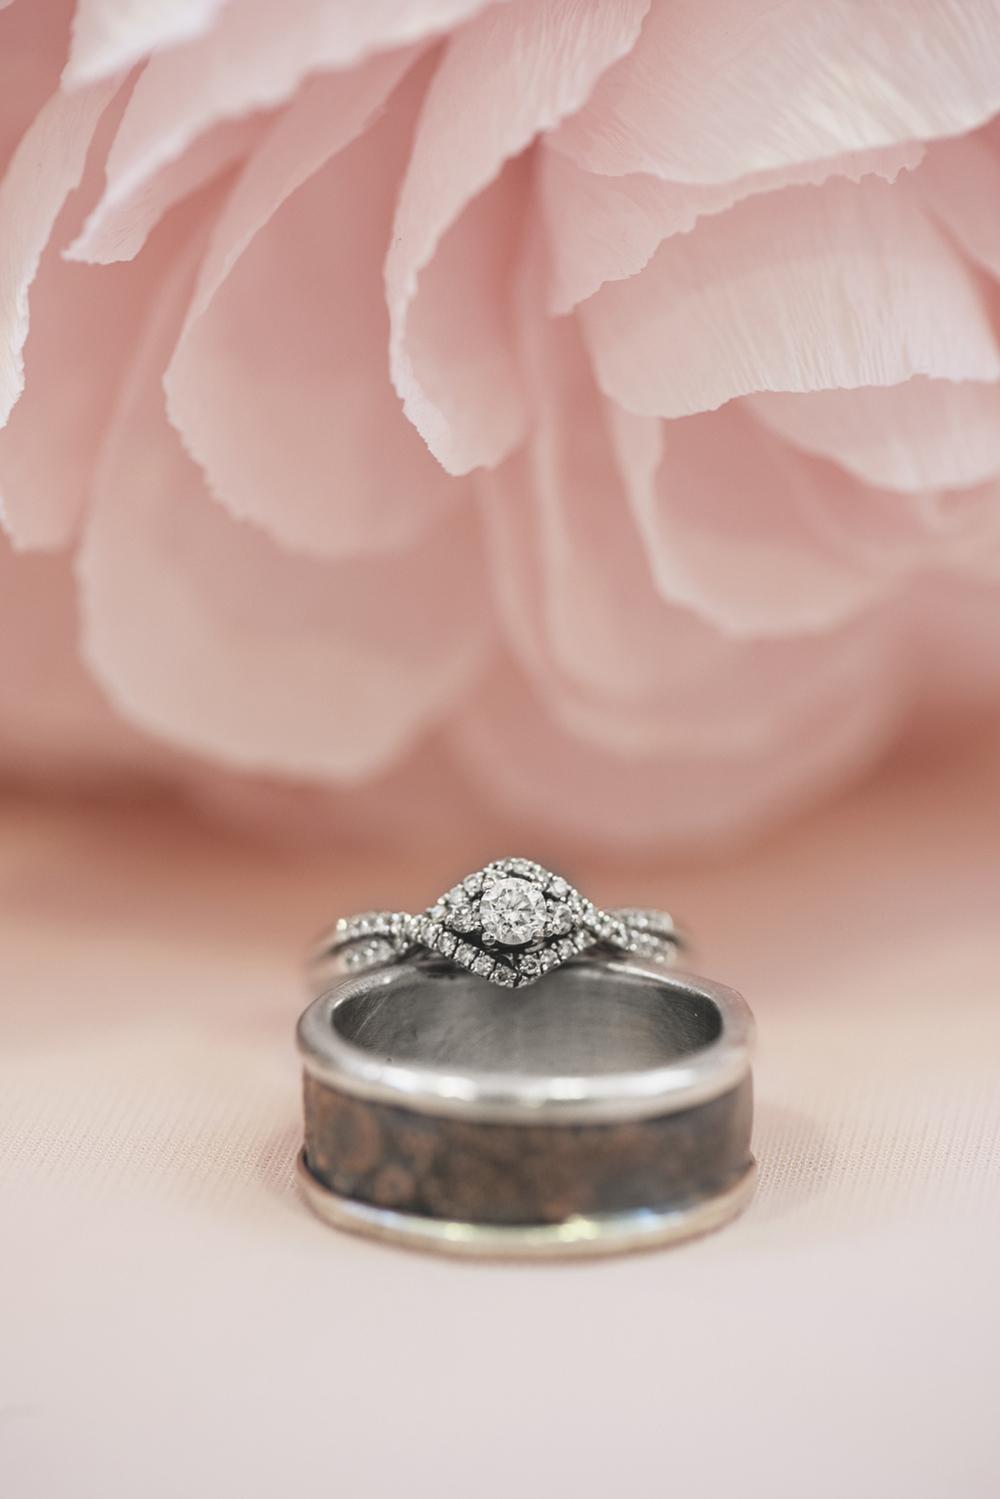 Blush, mint, and gold spring wedding | Yorktown, Virginia wedding | Wedding ring